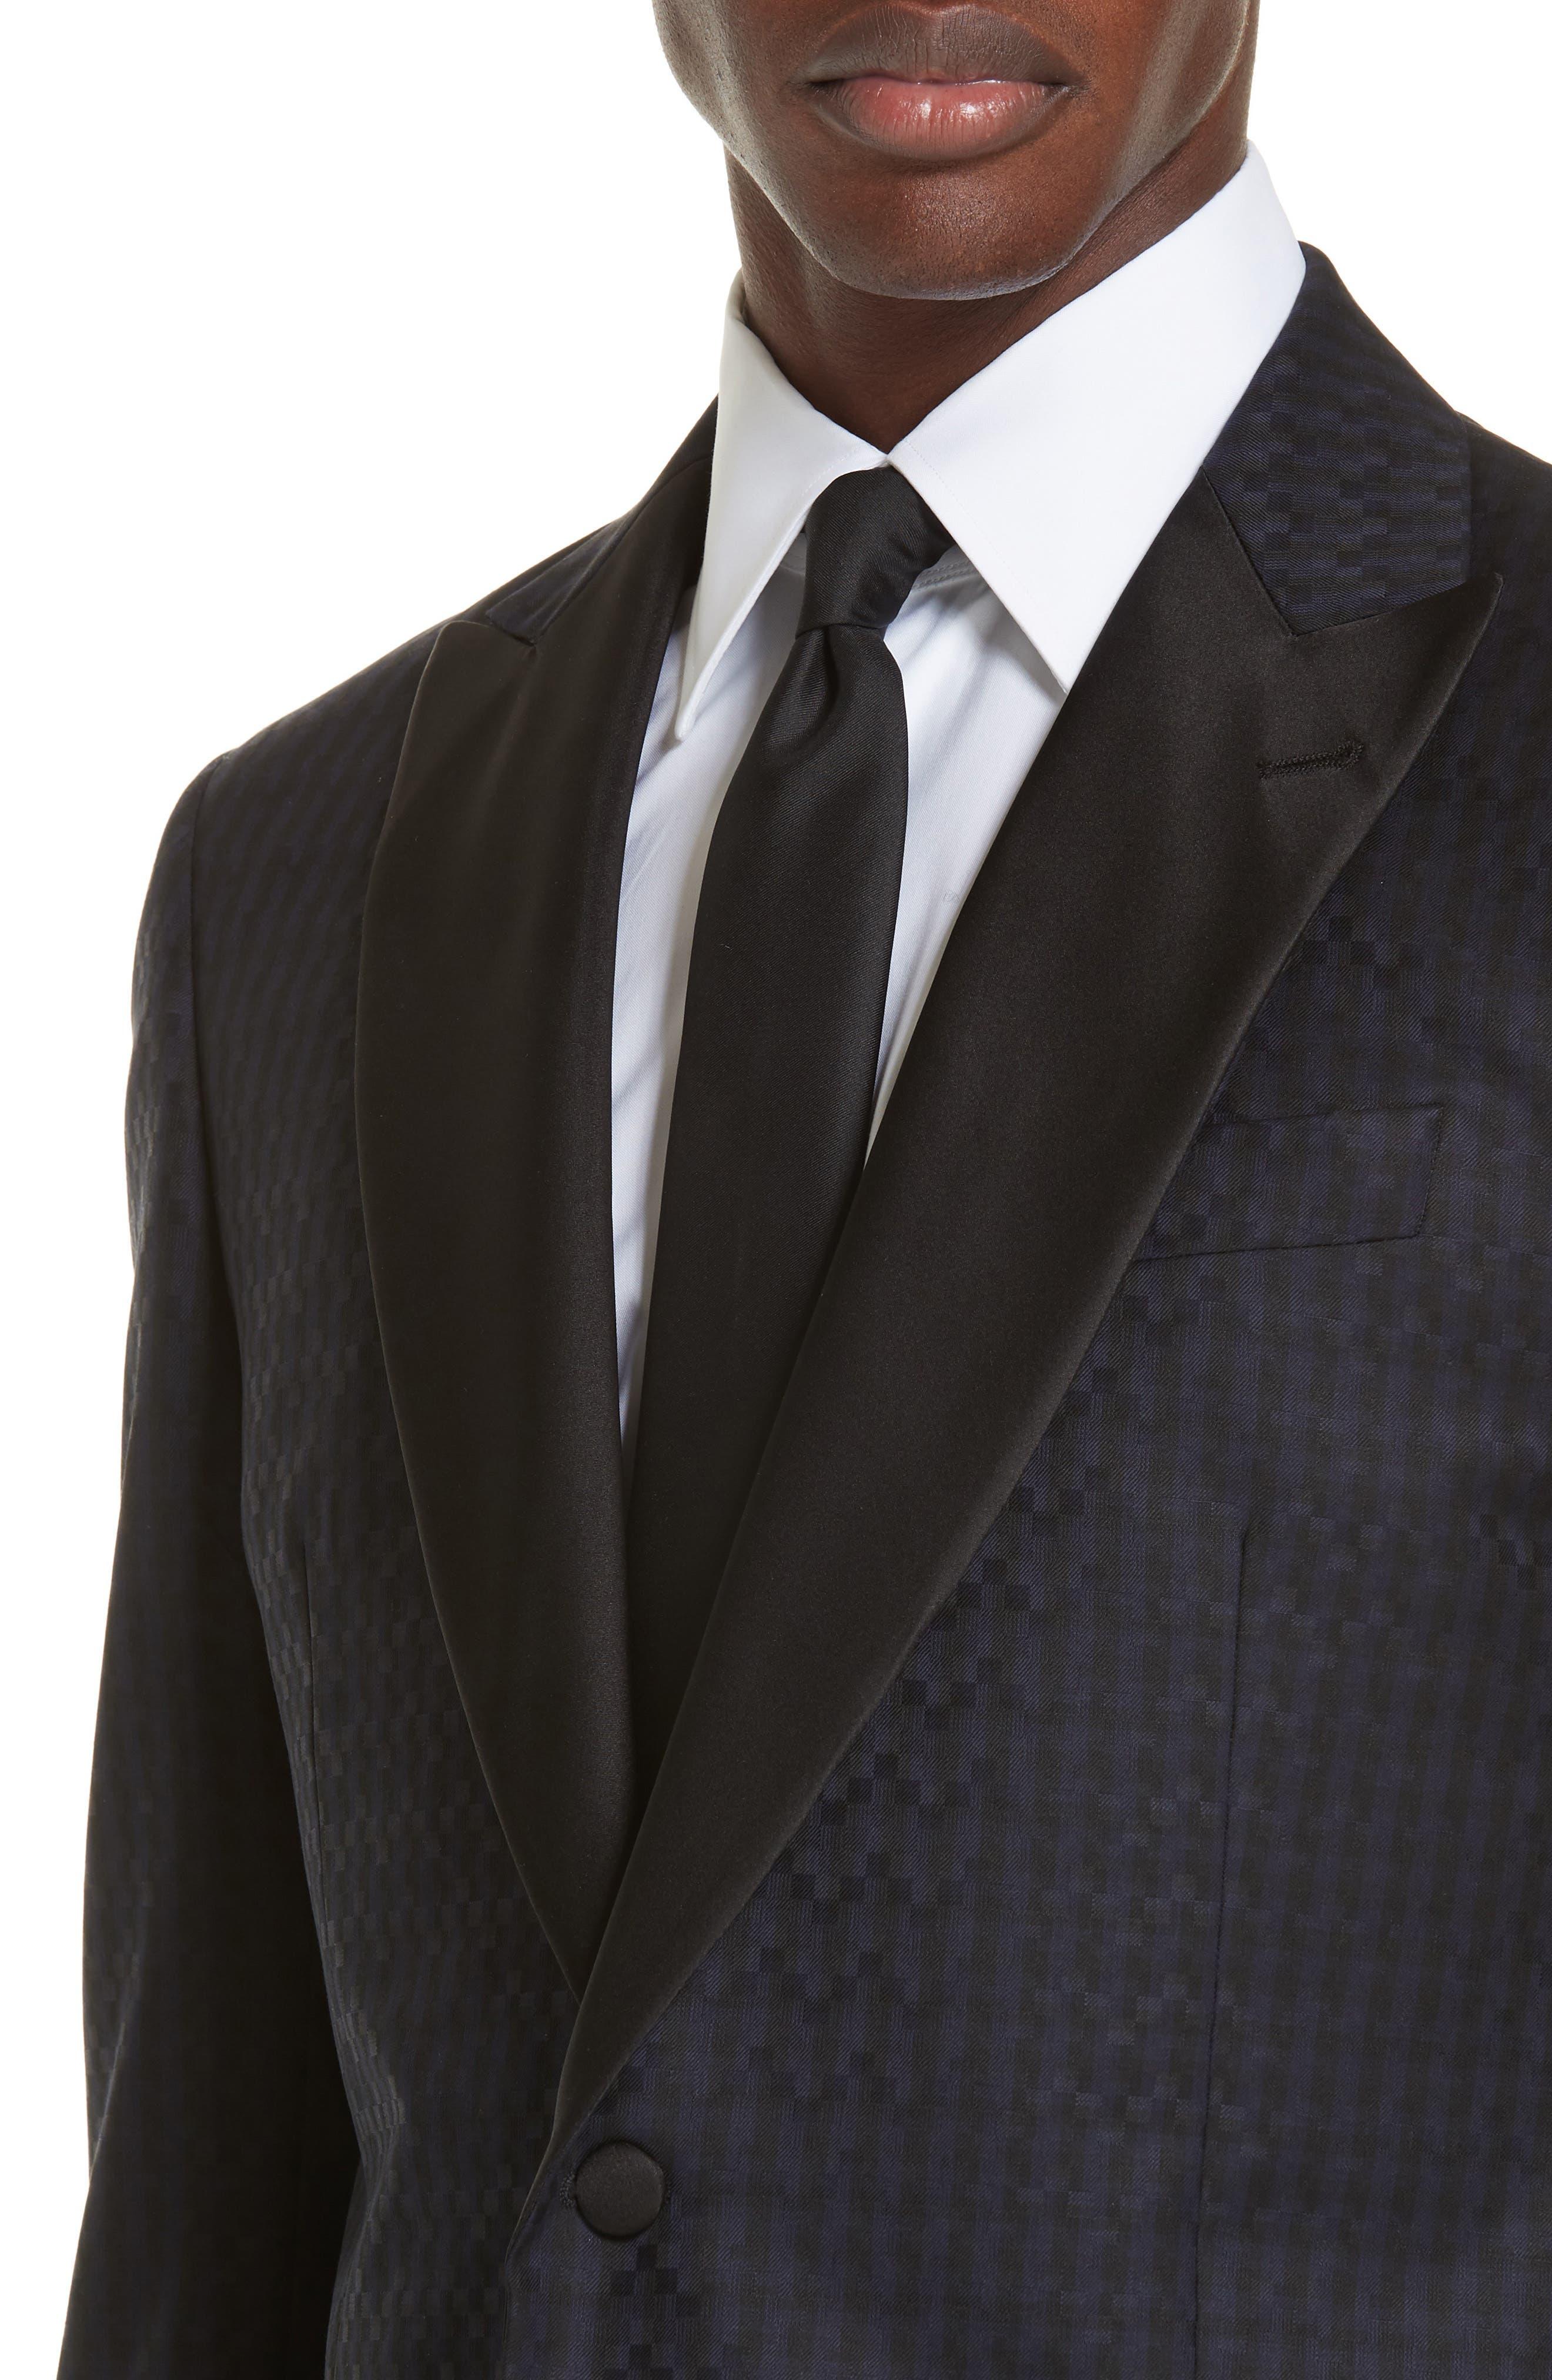 G-Line Trim Fit Wool Dinner Jacket,                             Alternate thumbnail 4, color,                             MIDNIGHT